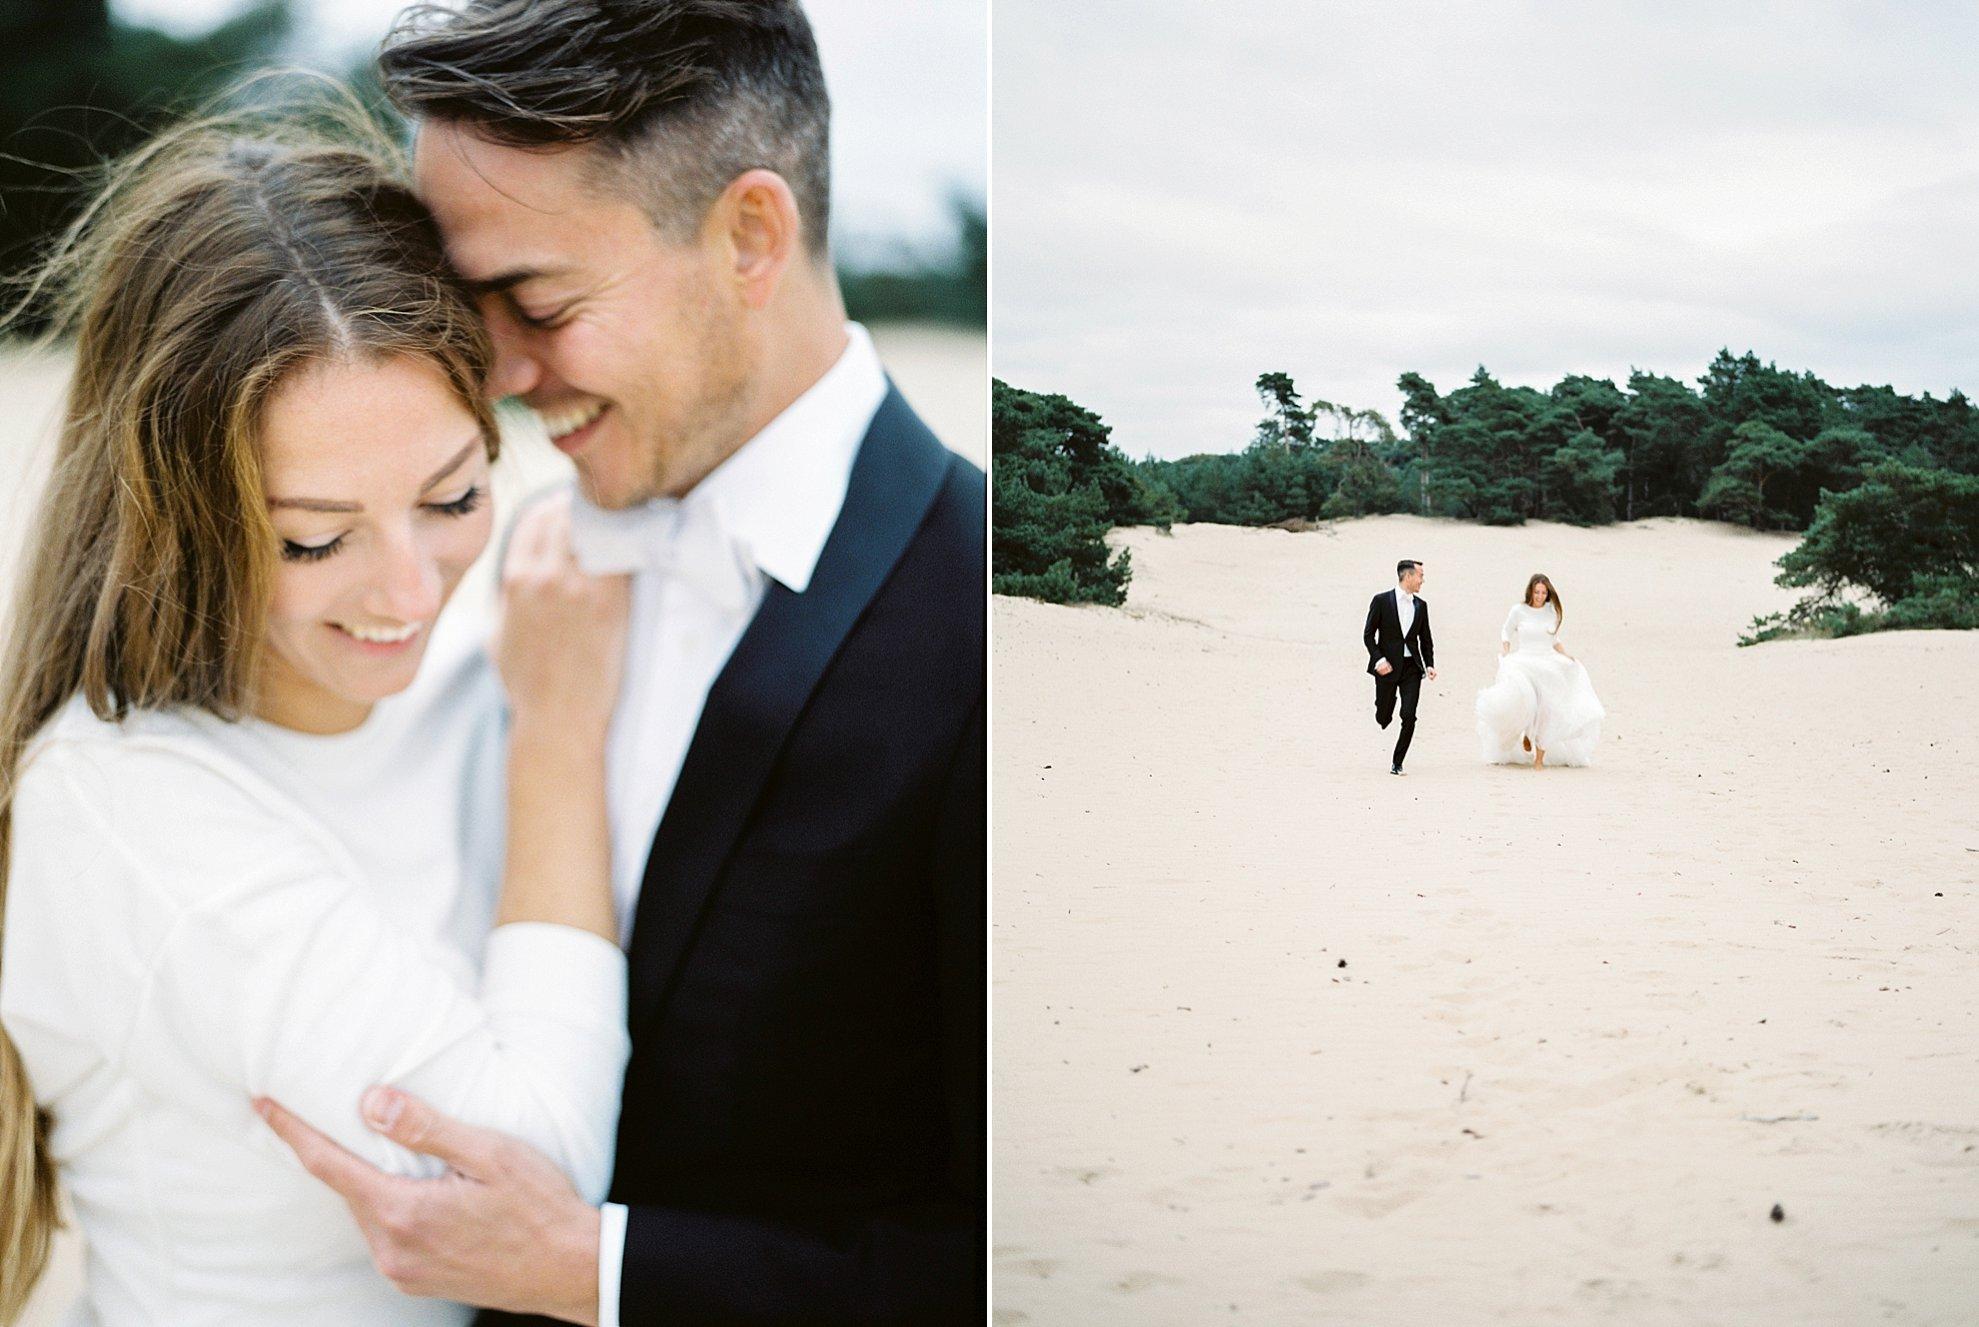 Amanda-Drost-photography-fine-art-nederland-couple-shoot-editorial_0016.jpg